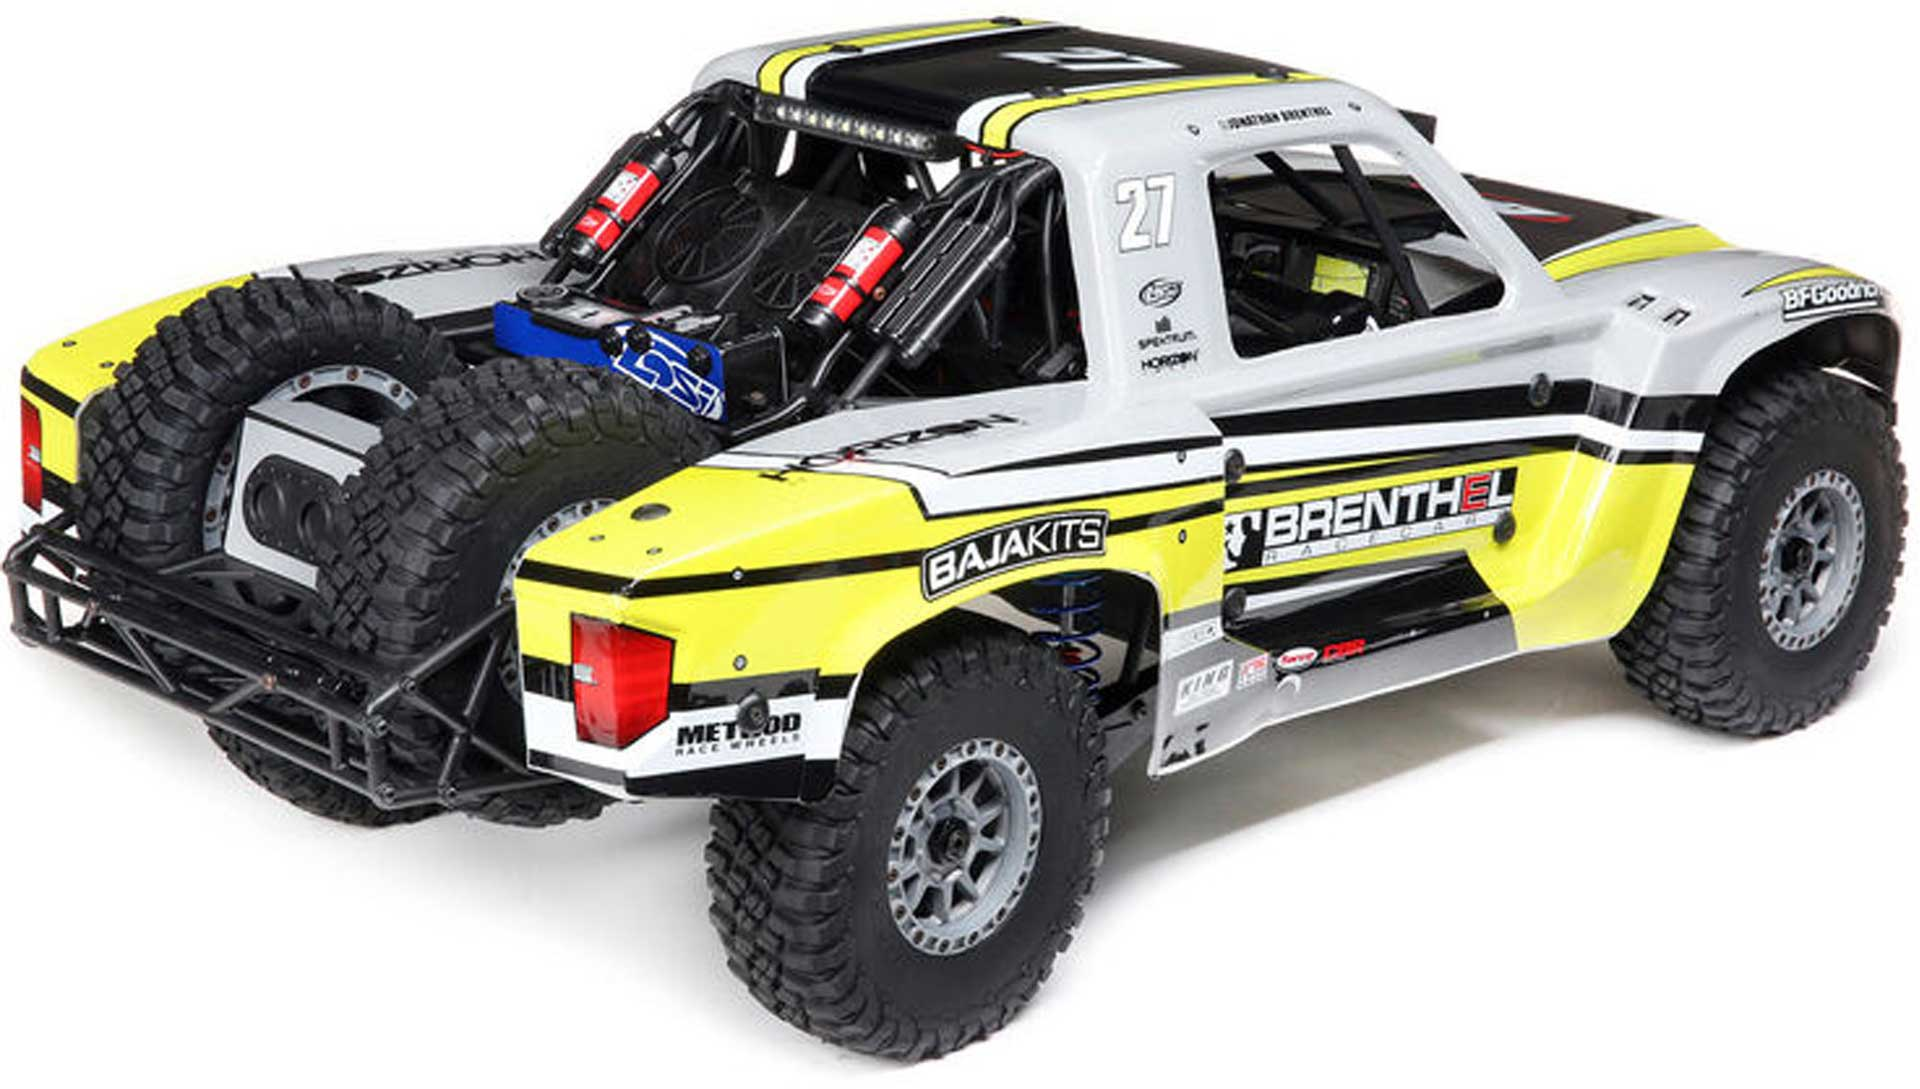 LOSI Super Baja Rey 2.0 1/6 4WD Desert Truck Brenthel